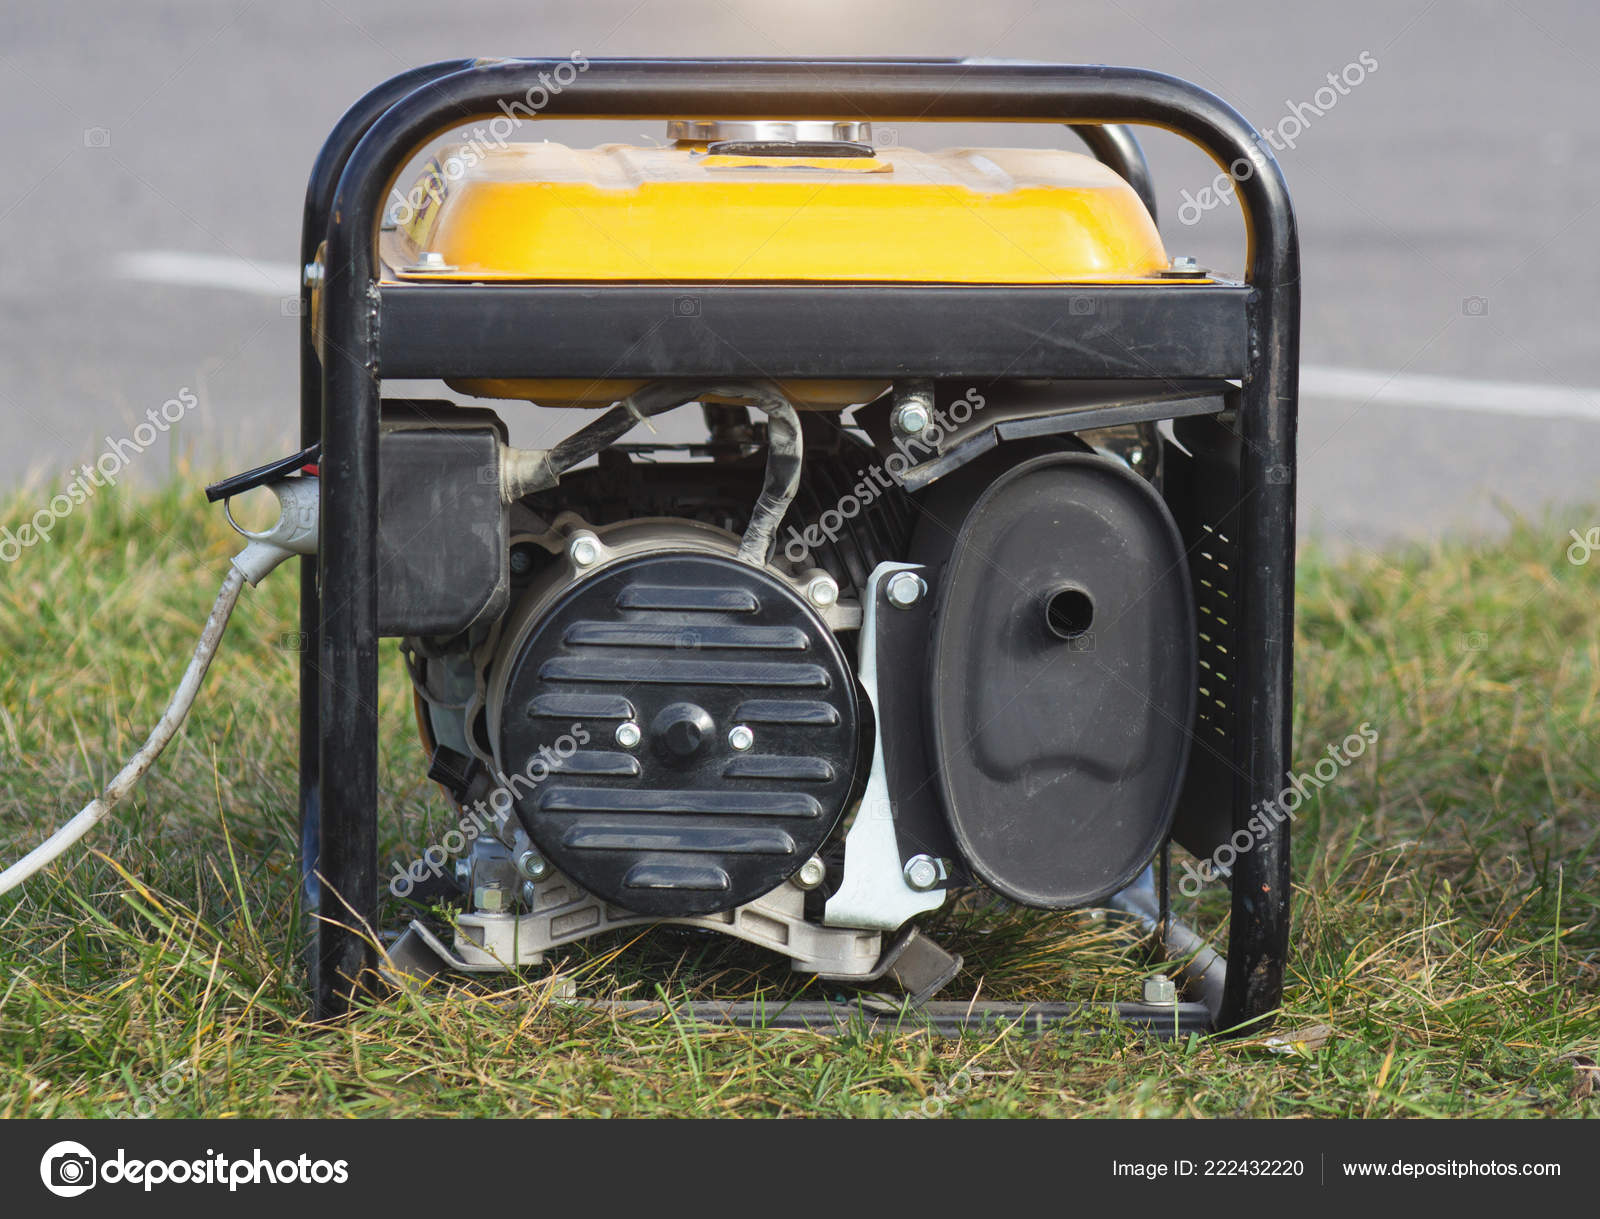 Portable gasoline generator, close-up, alternator